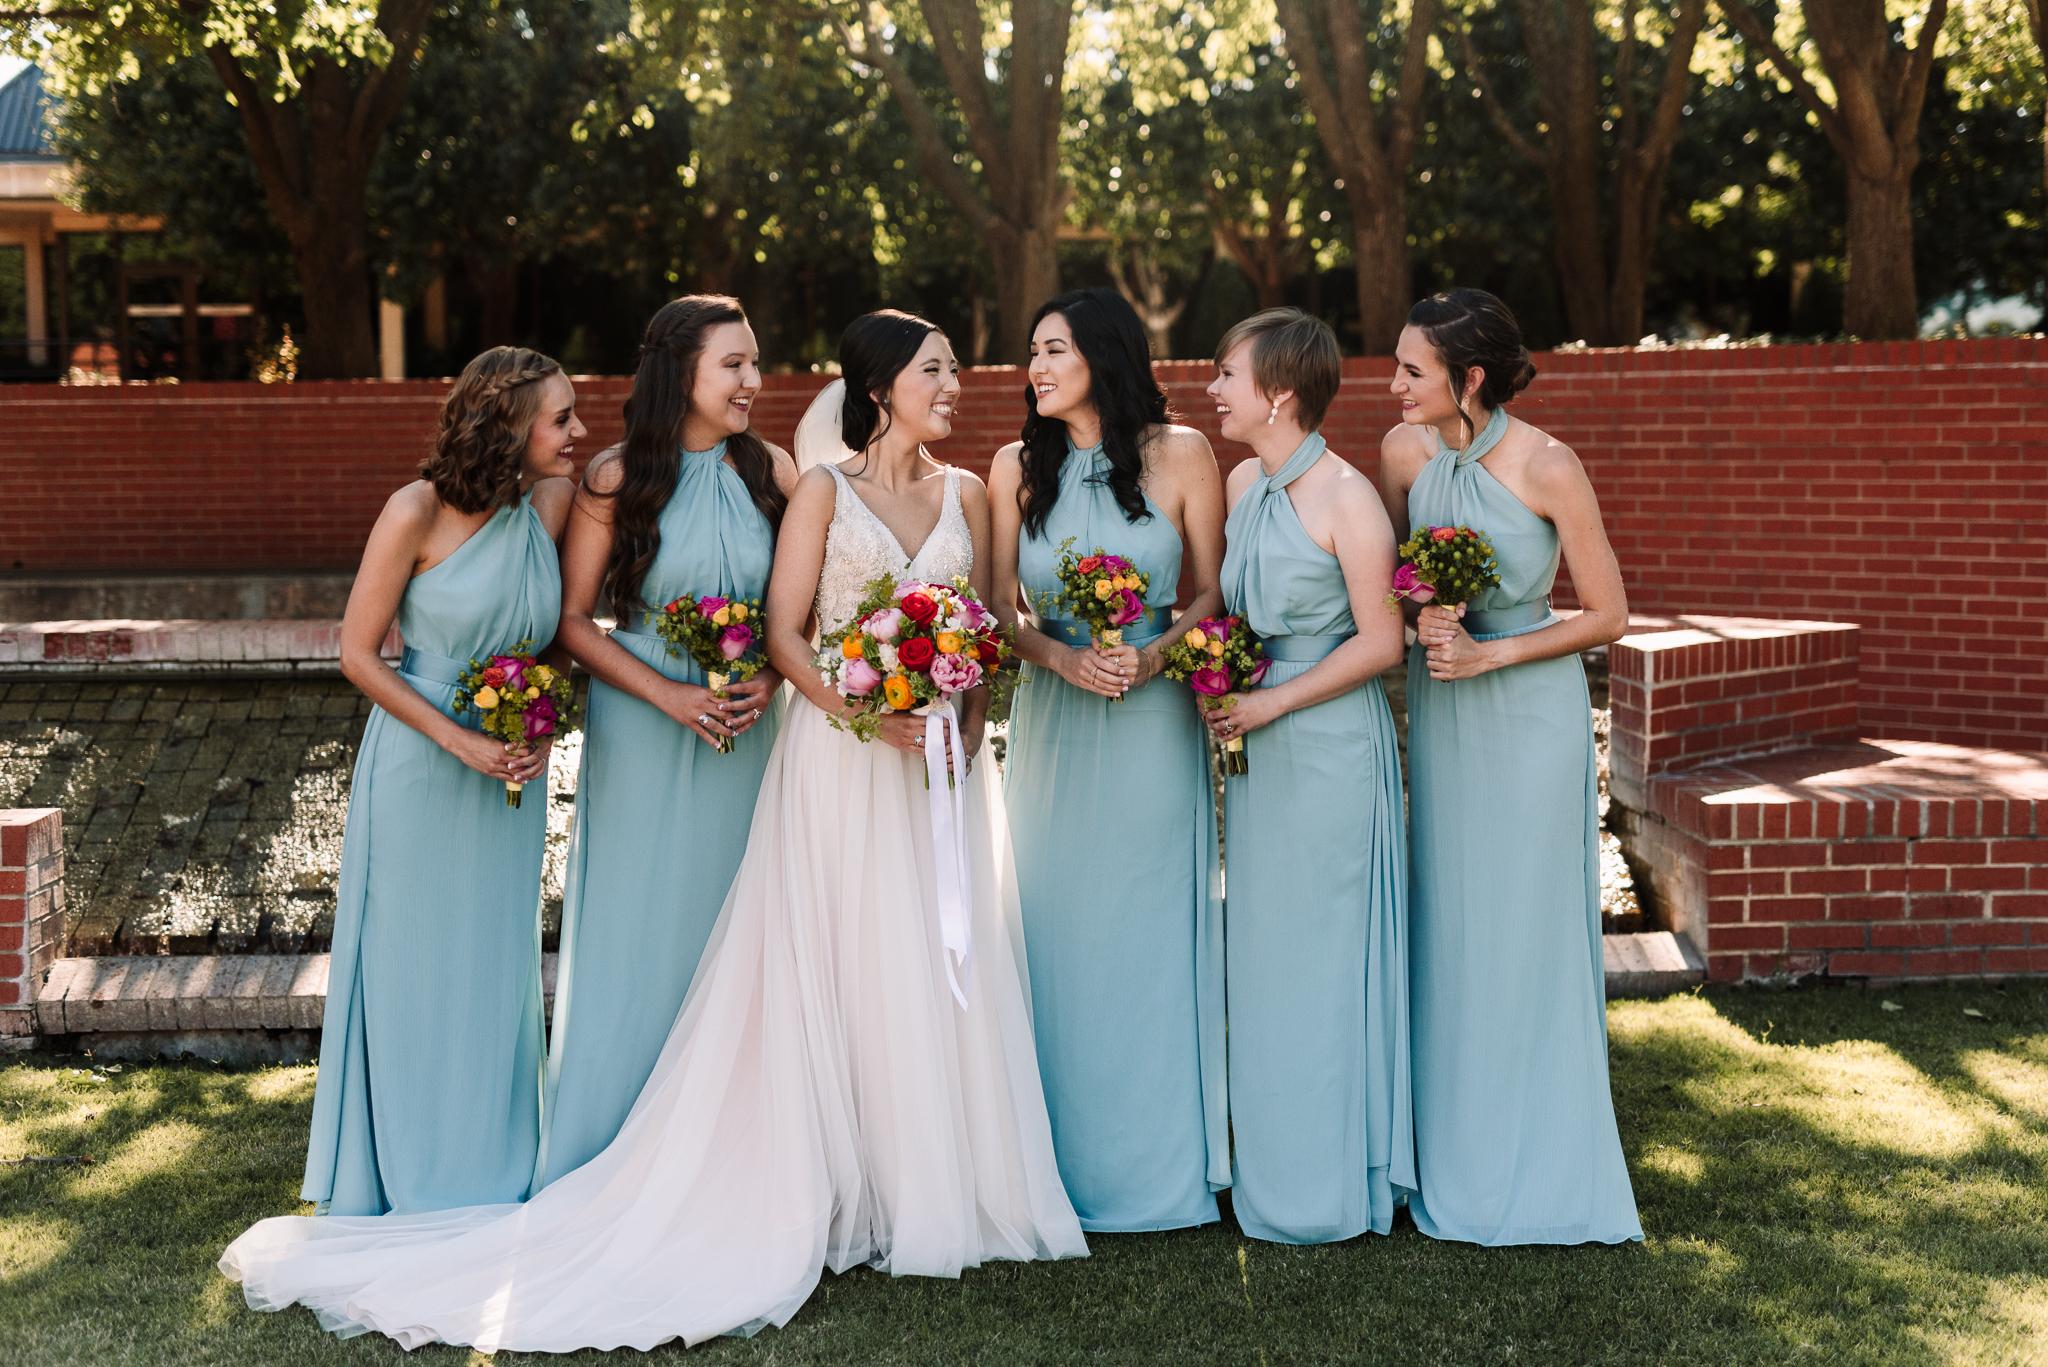 Oklahoma-Christian-University-Wedding-7726.jpg